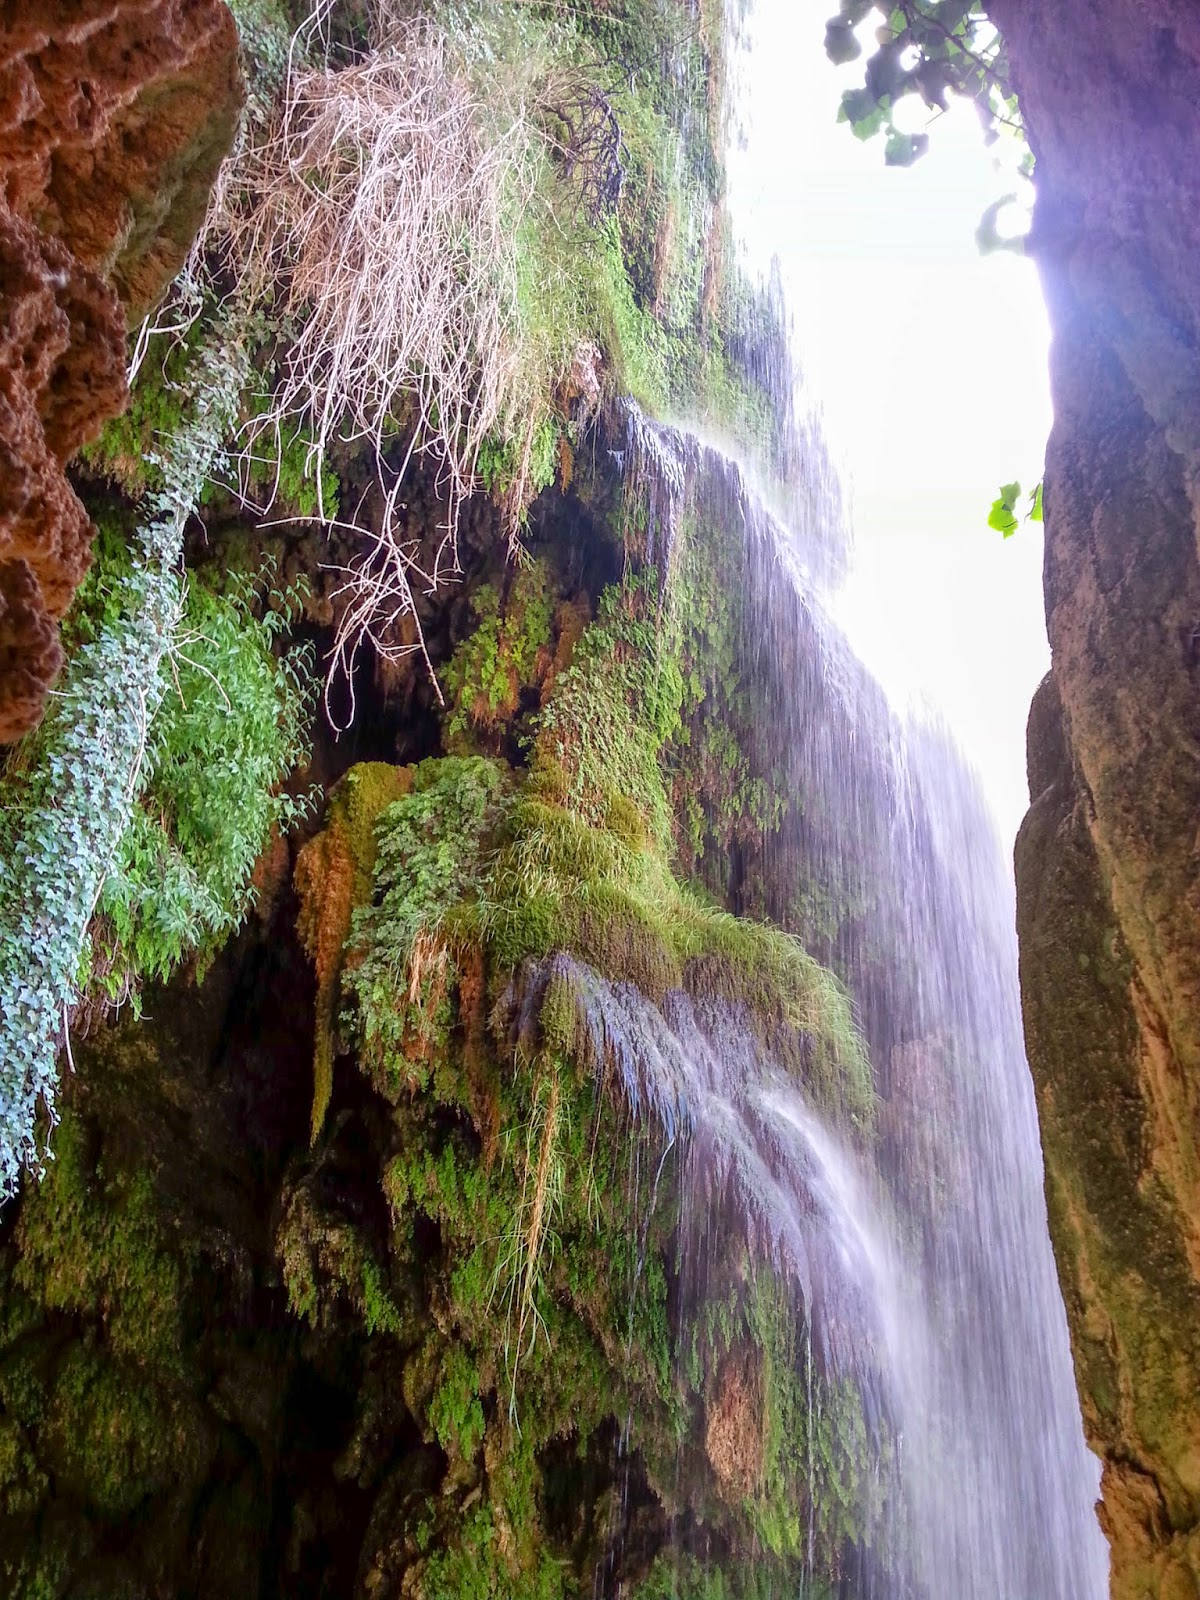 Cascada la Caprichosa. Guía de turismo del Monasterio de Piedra. Tu Maleta.